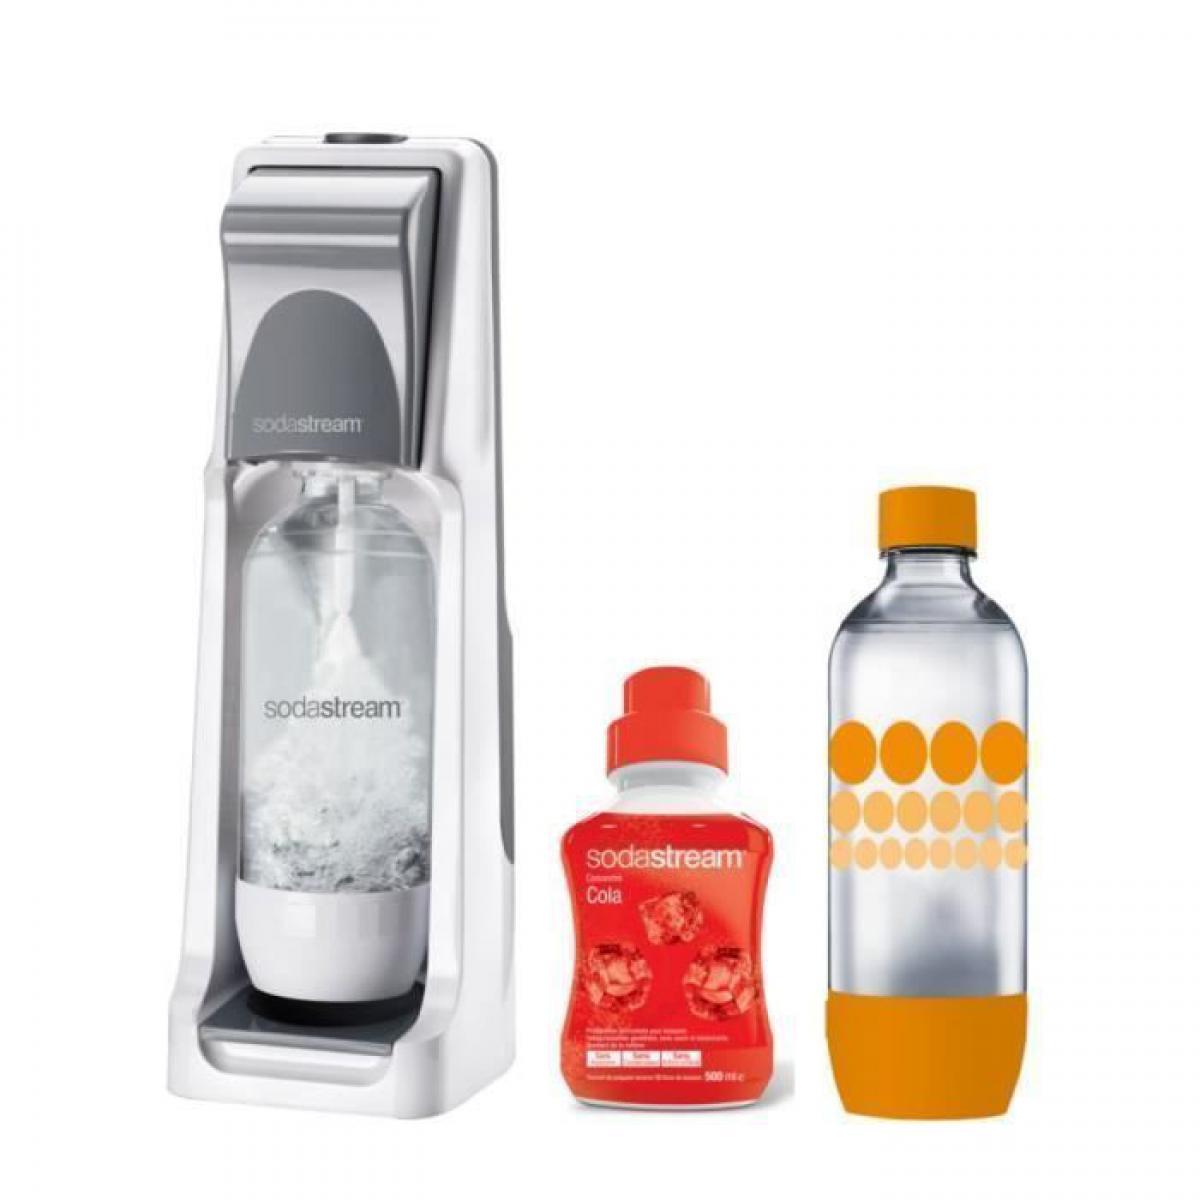 Sodastream SODASTREAM Pack : Machine a gazeifier Cool Titan + 1 concentre cola 500ml + 1 bouteille Grand modele Pet